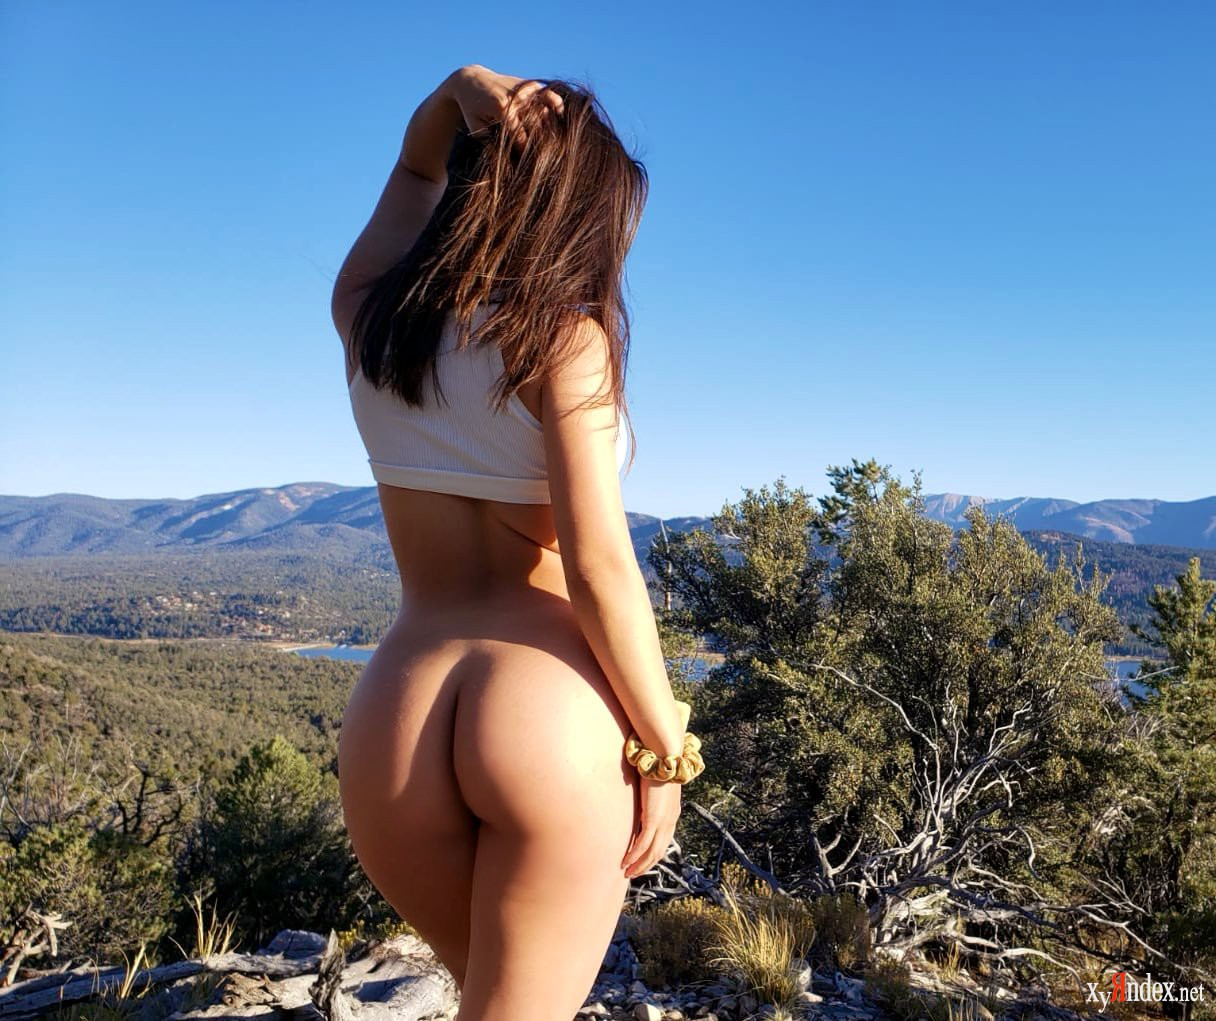 Hot country girls naked model